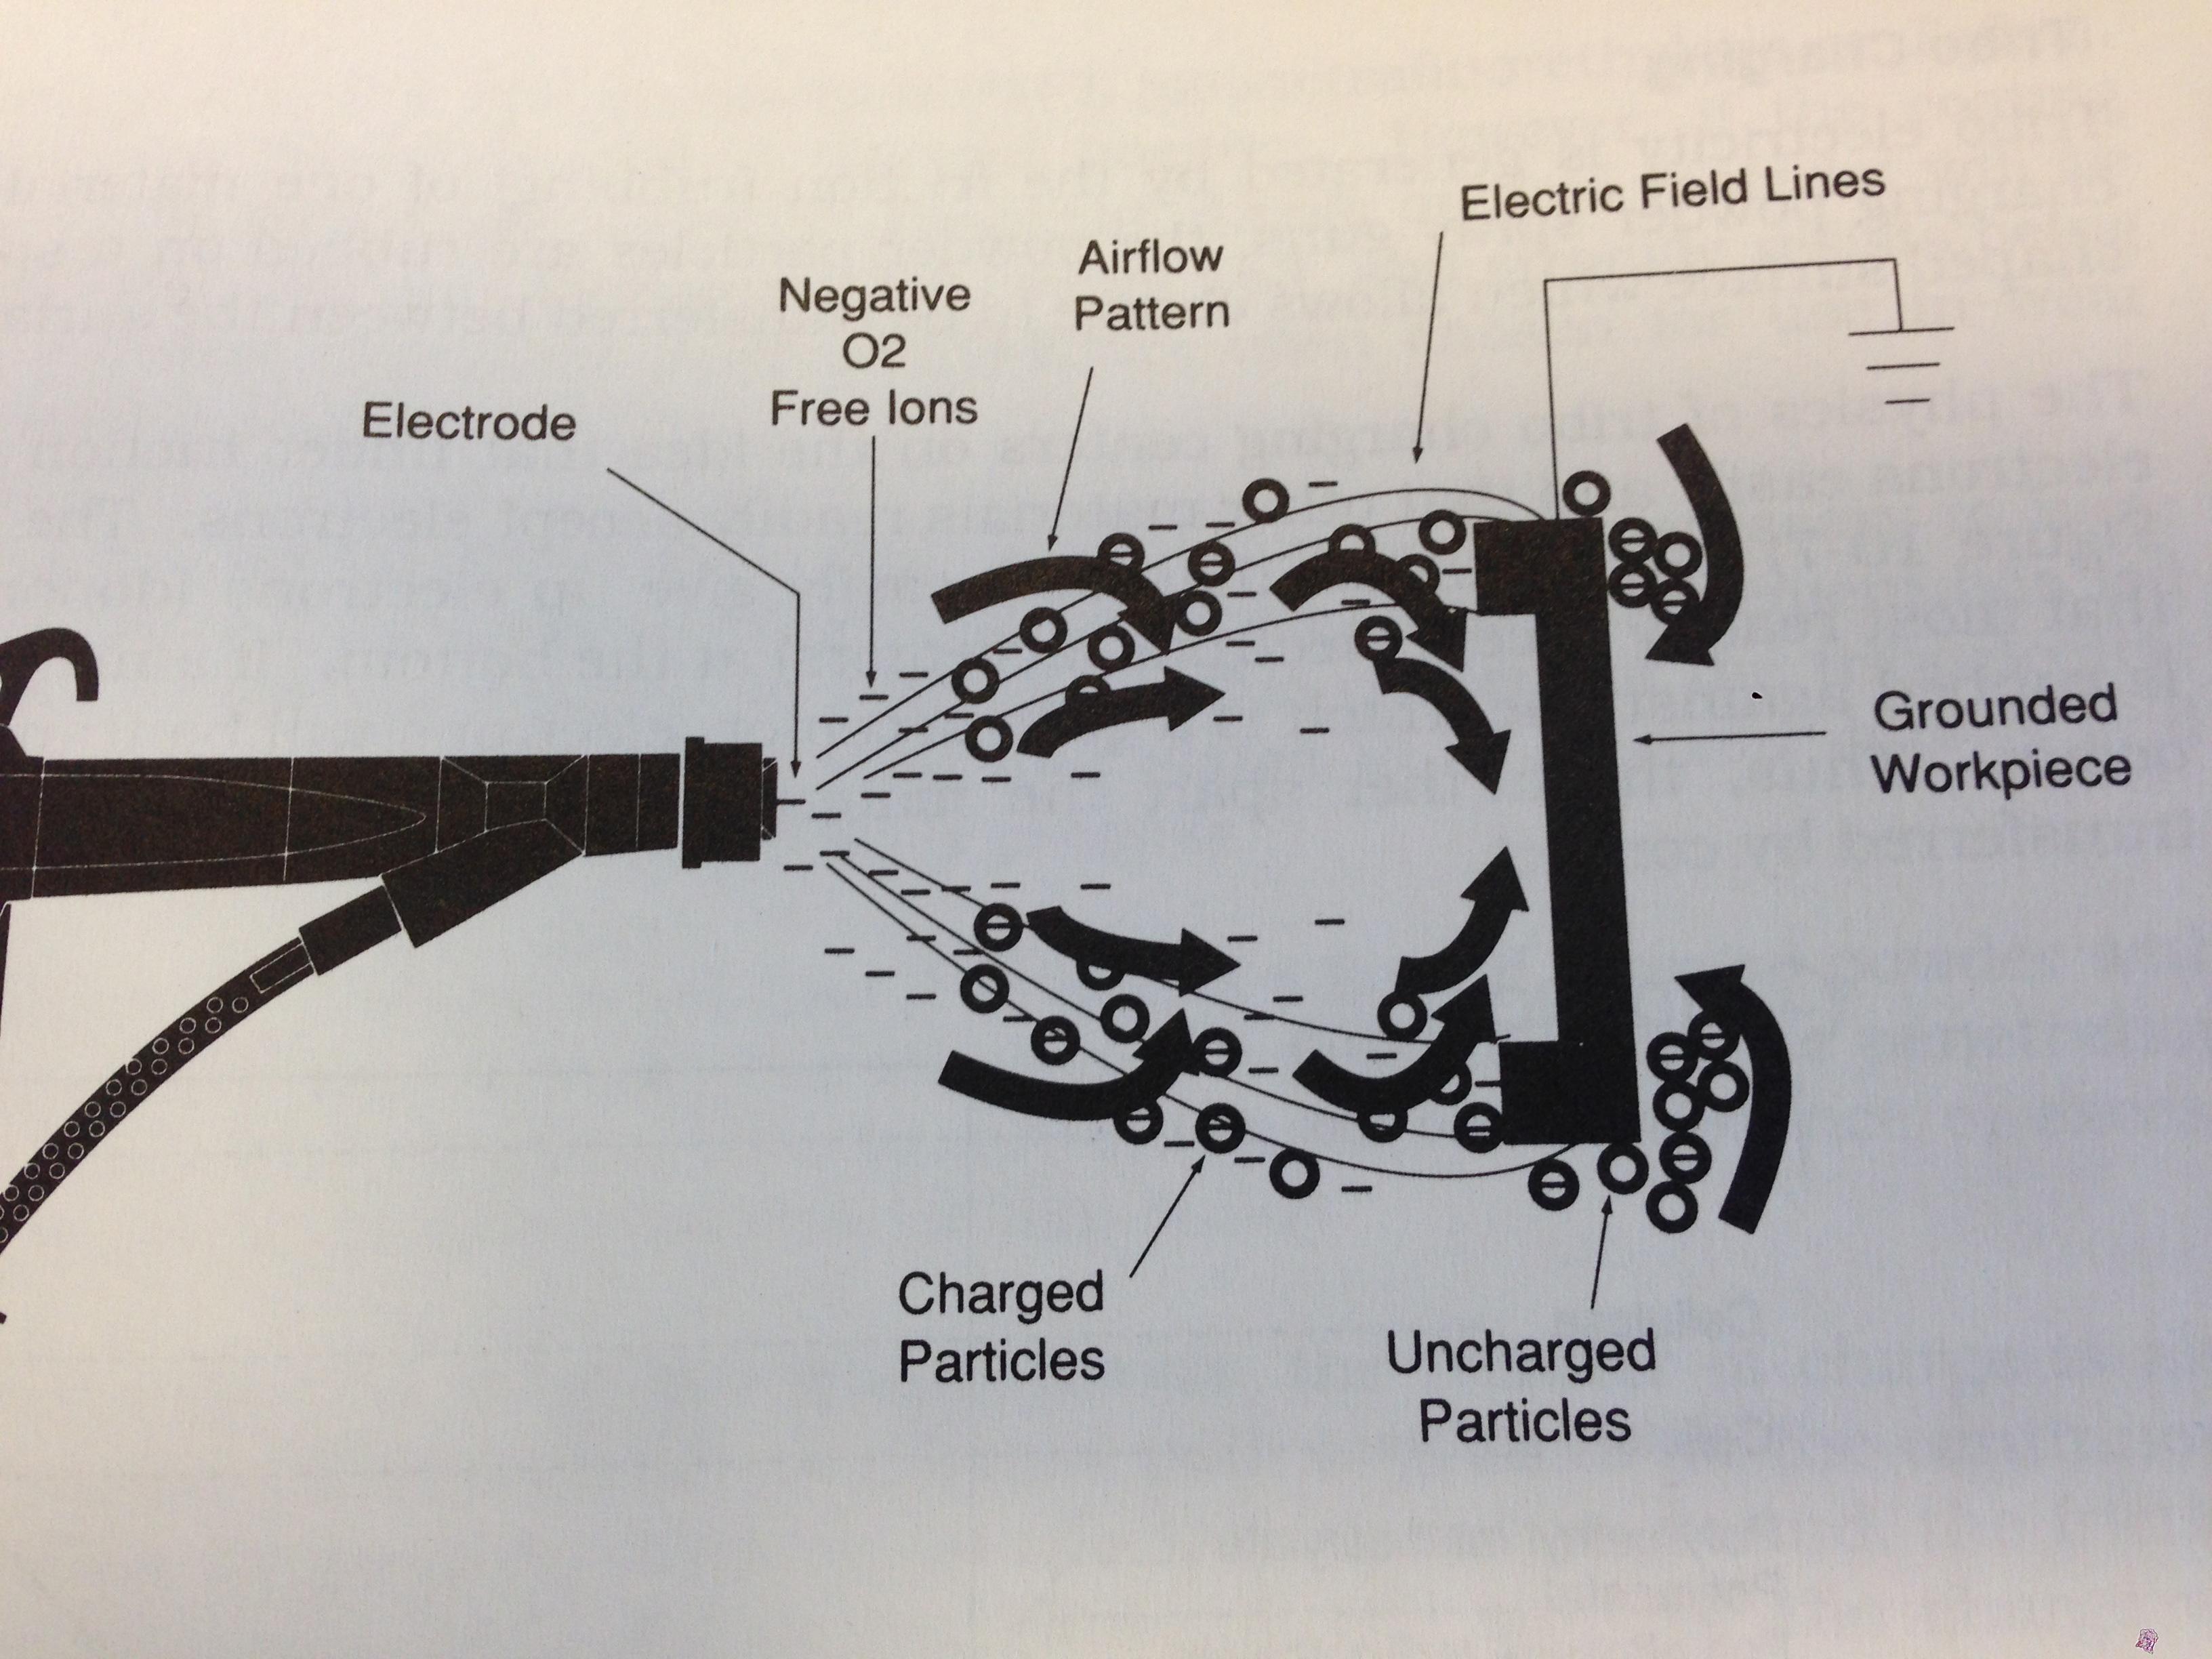 The powder coating technology